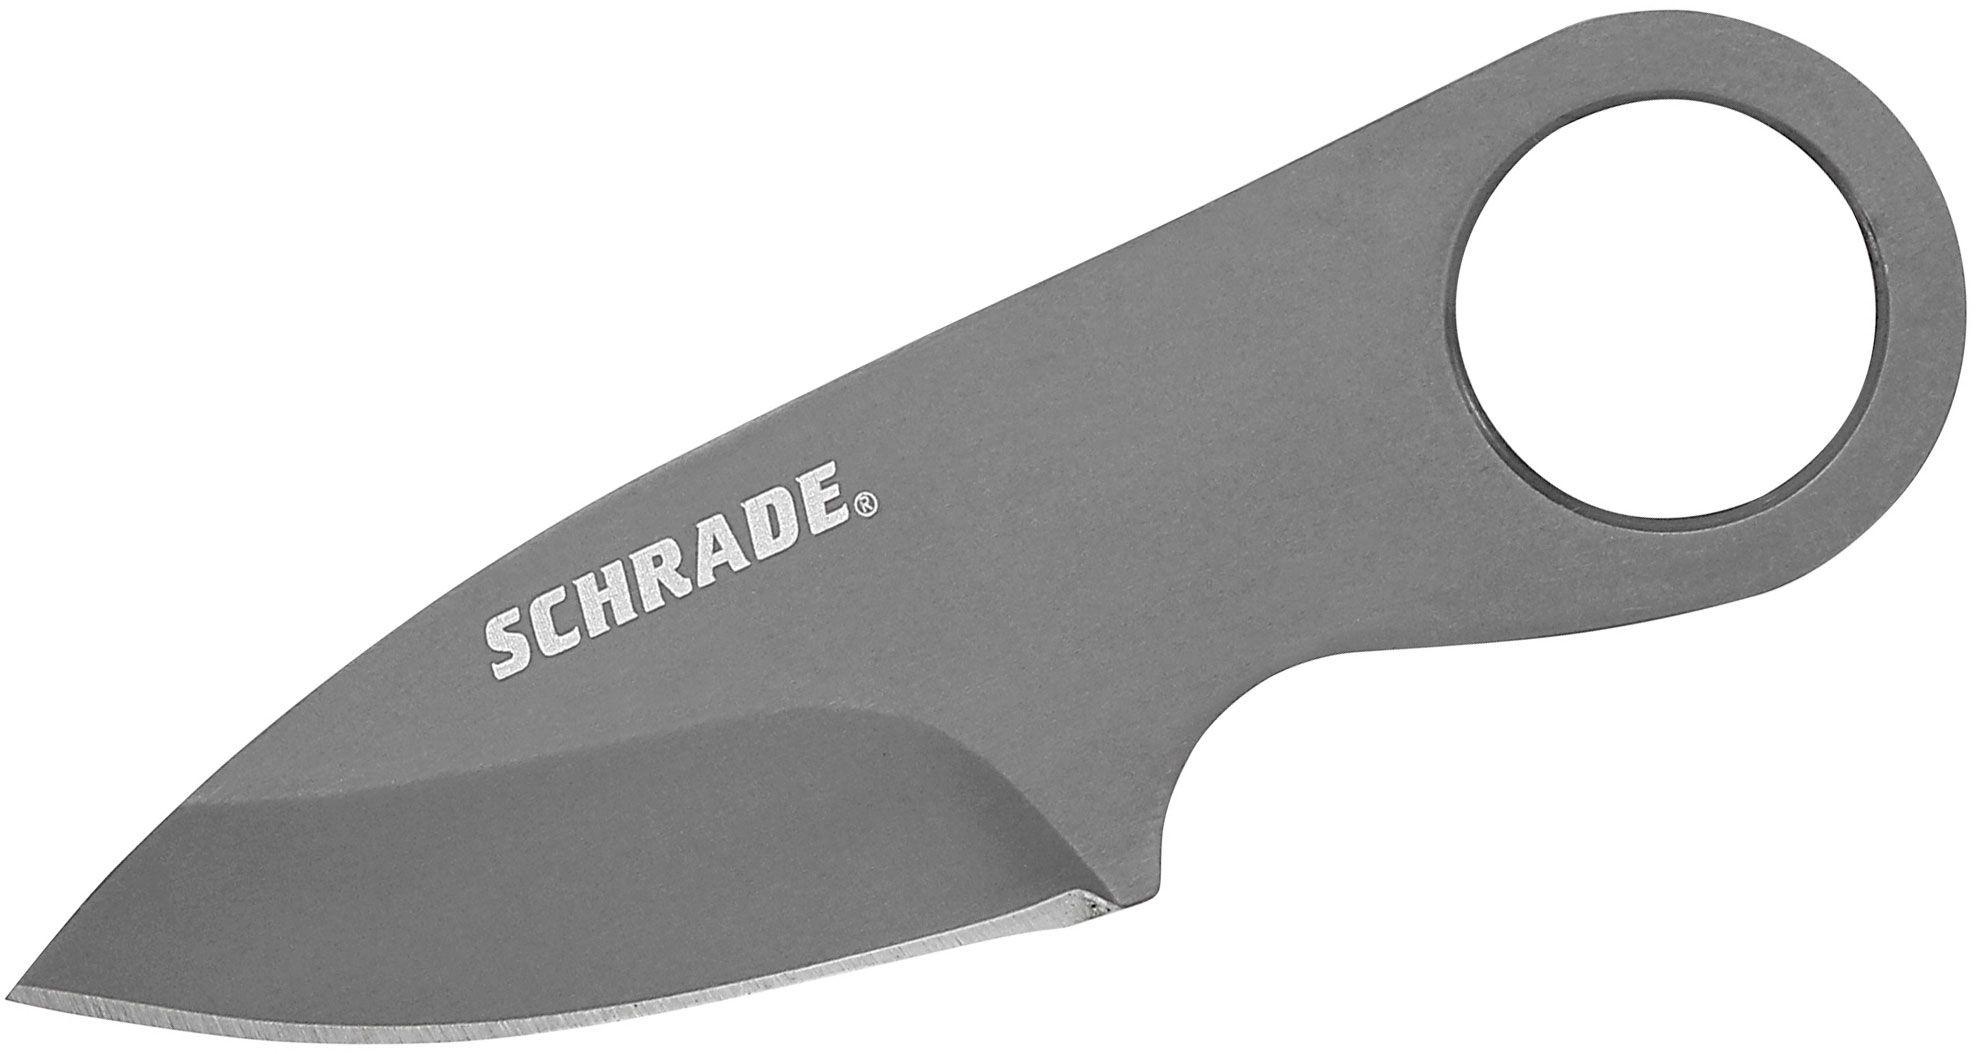 Schrade Credit Card Money Clip Neck Knife 1.9 inch Plain Blade, Zytel Sheath